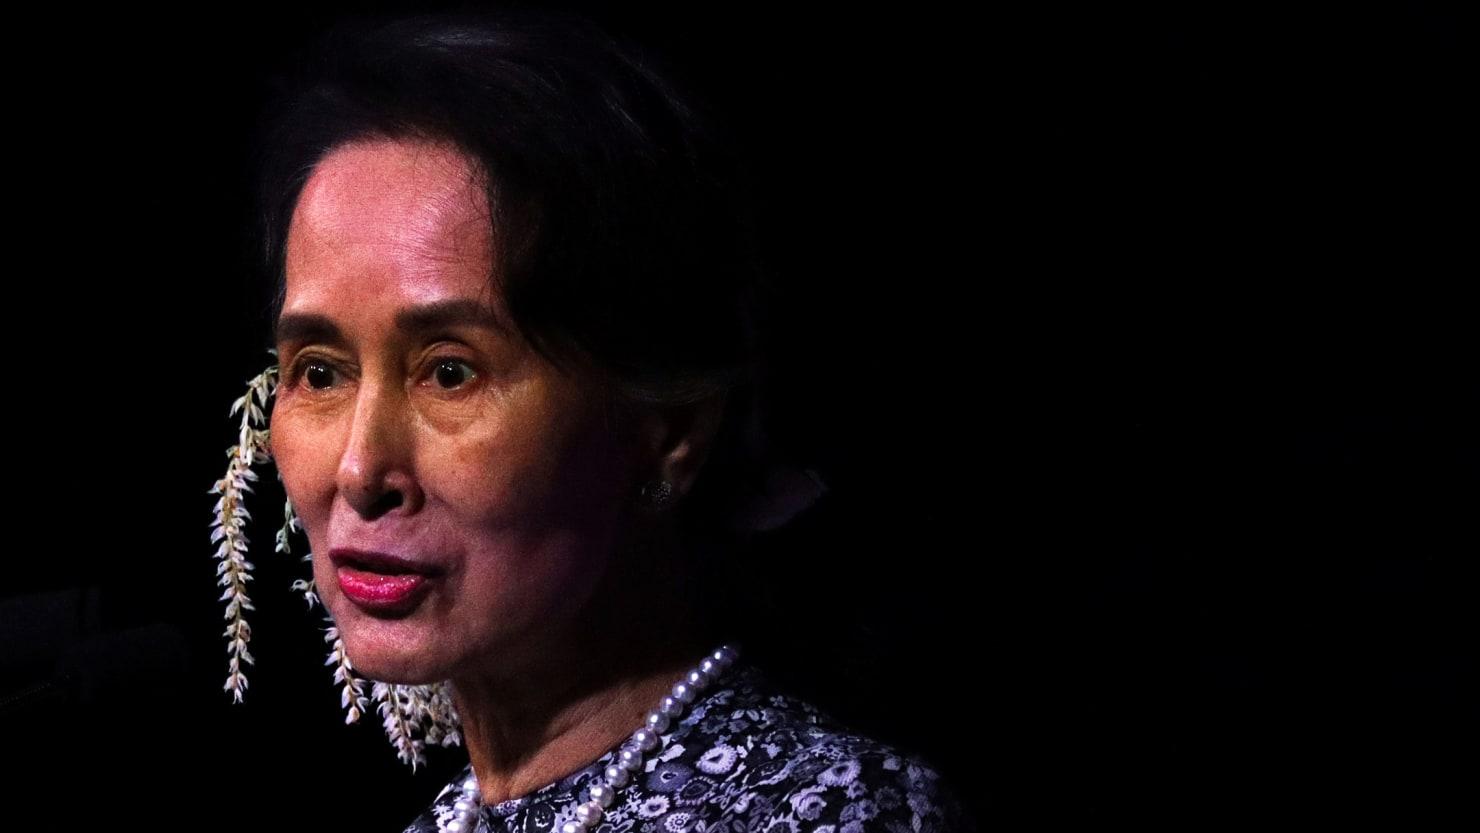 Myanmar Leader Aung San Suu Kyi Stripped of Amnesty's Human Rights Award